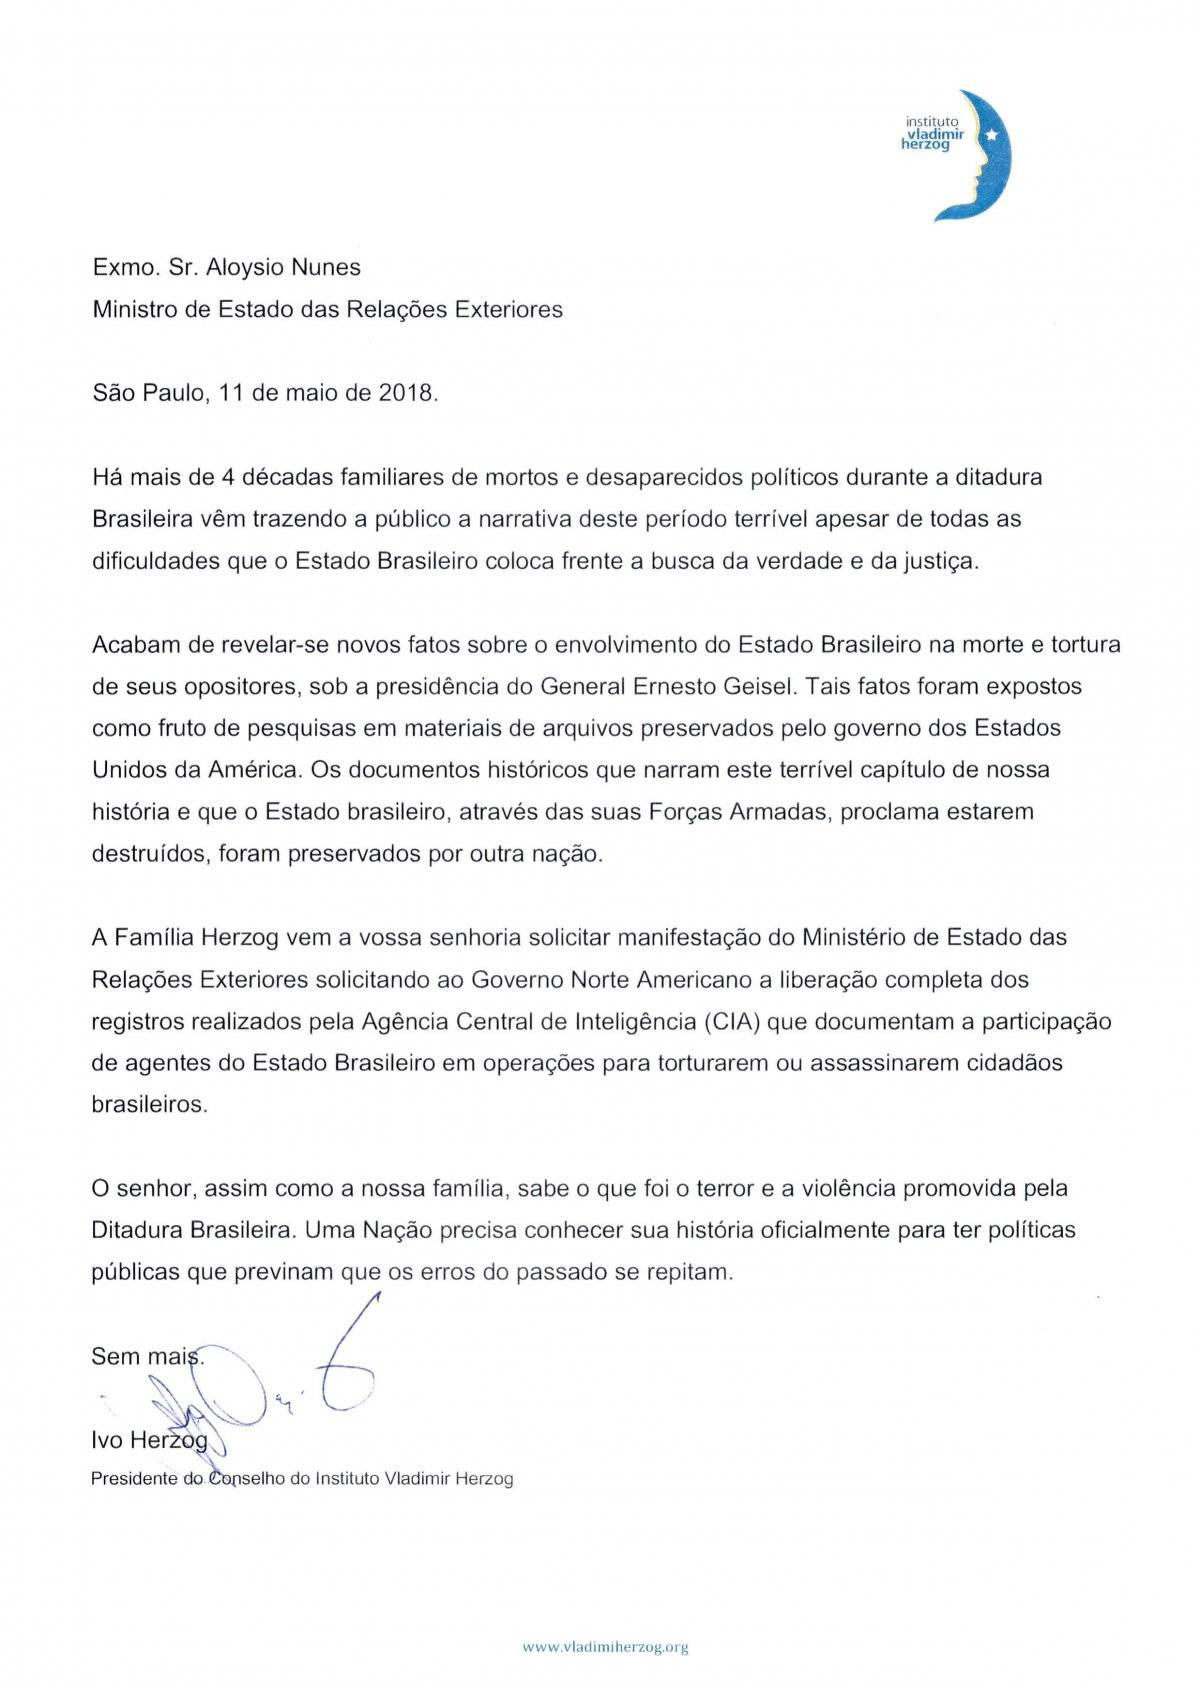 carta filho Vladimir Herzog